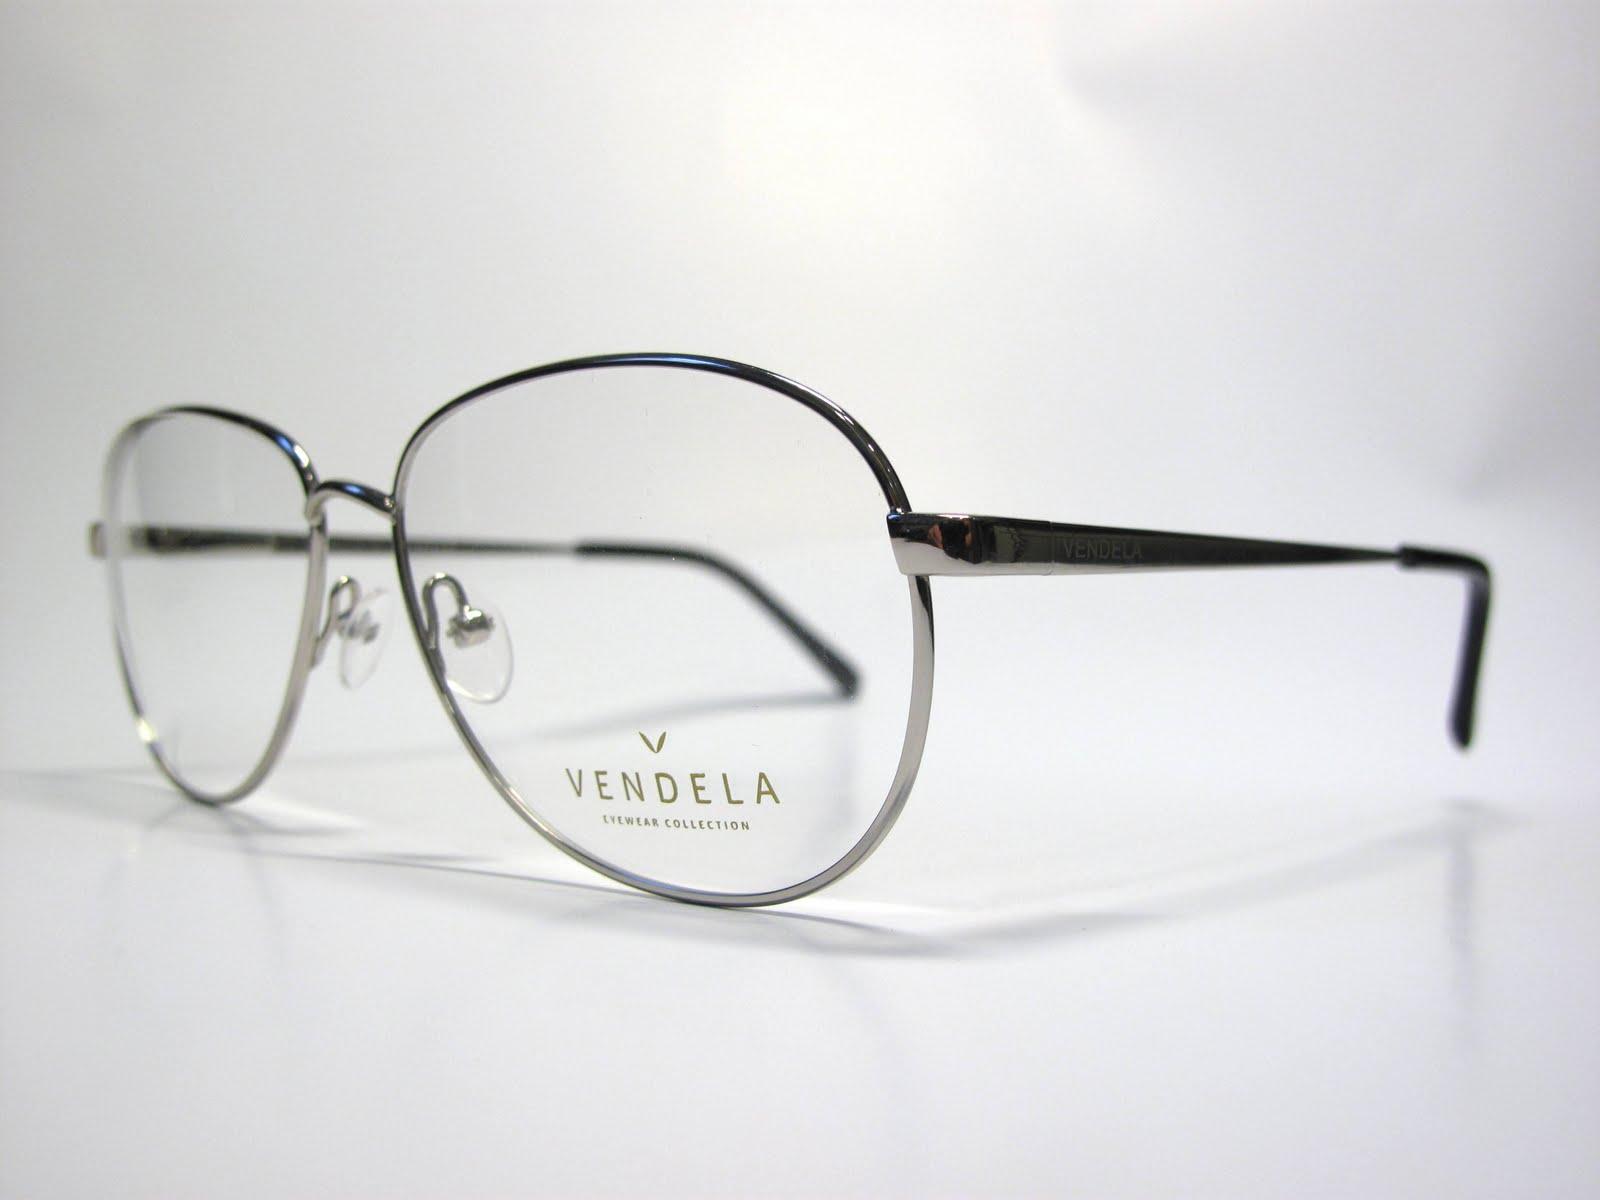 vendela kirsebom glasögonbågar